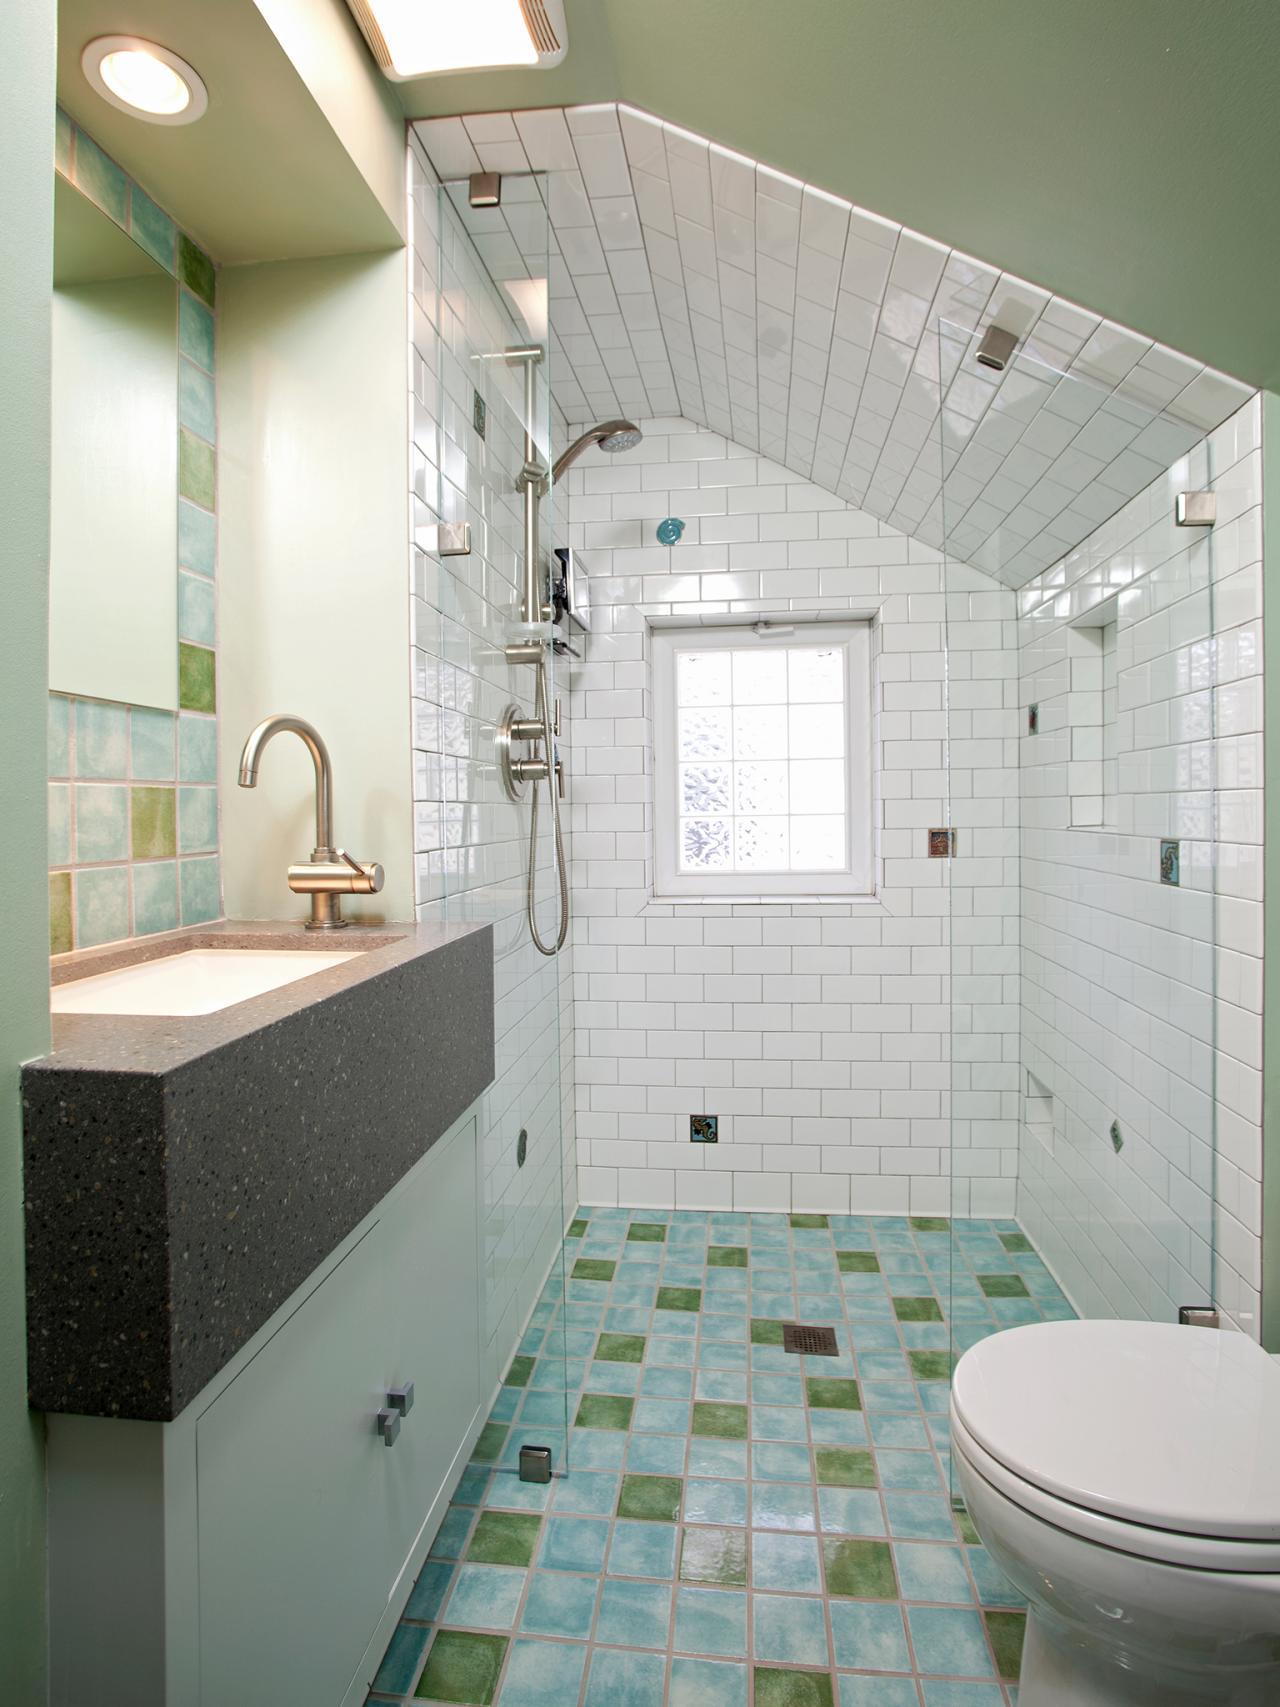 NKBA-2013_01-Art-Deco-Bathroom-050413_s3x4.jpg.rend.hgtvcom.1280.1707